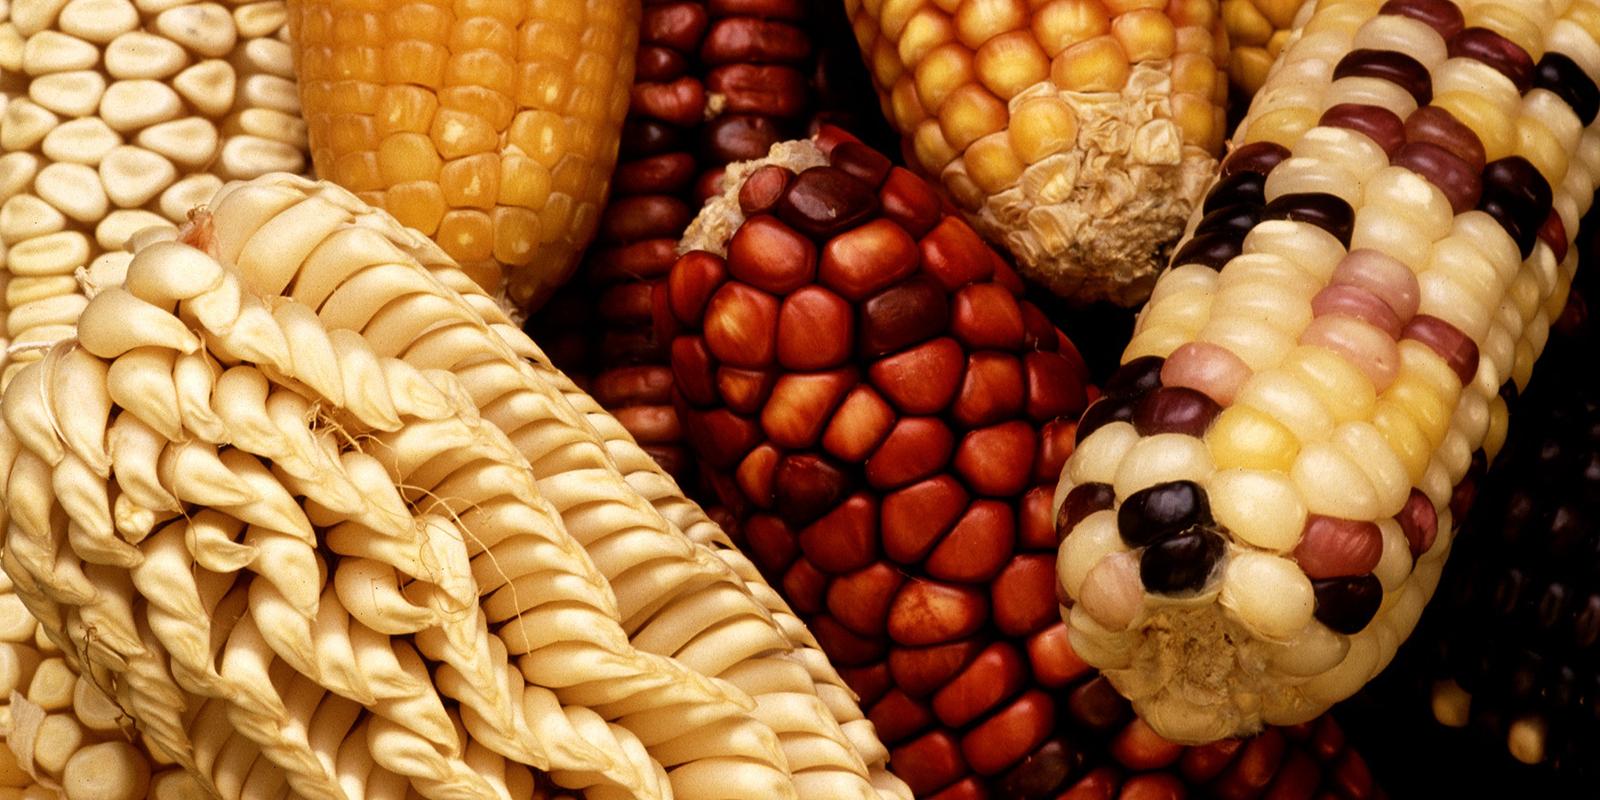 corn_corn_on_the_cob_harvest